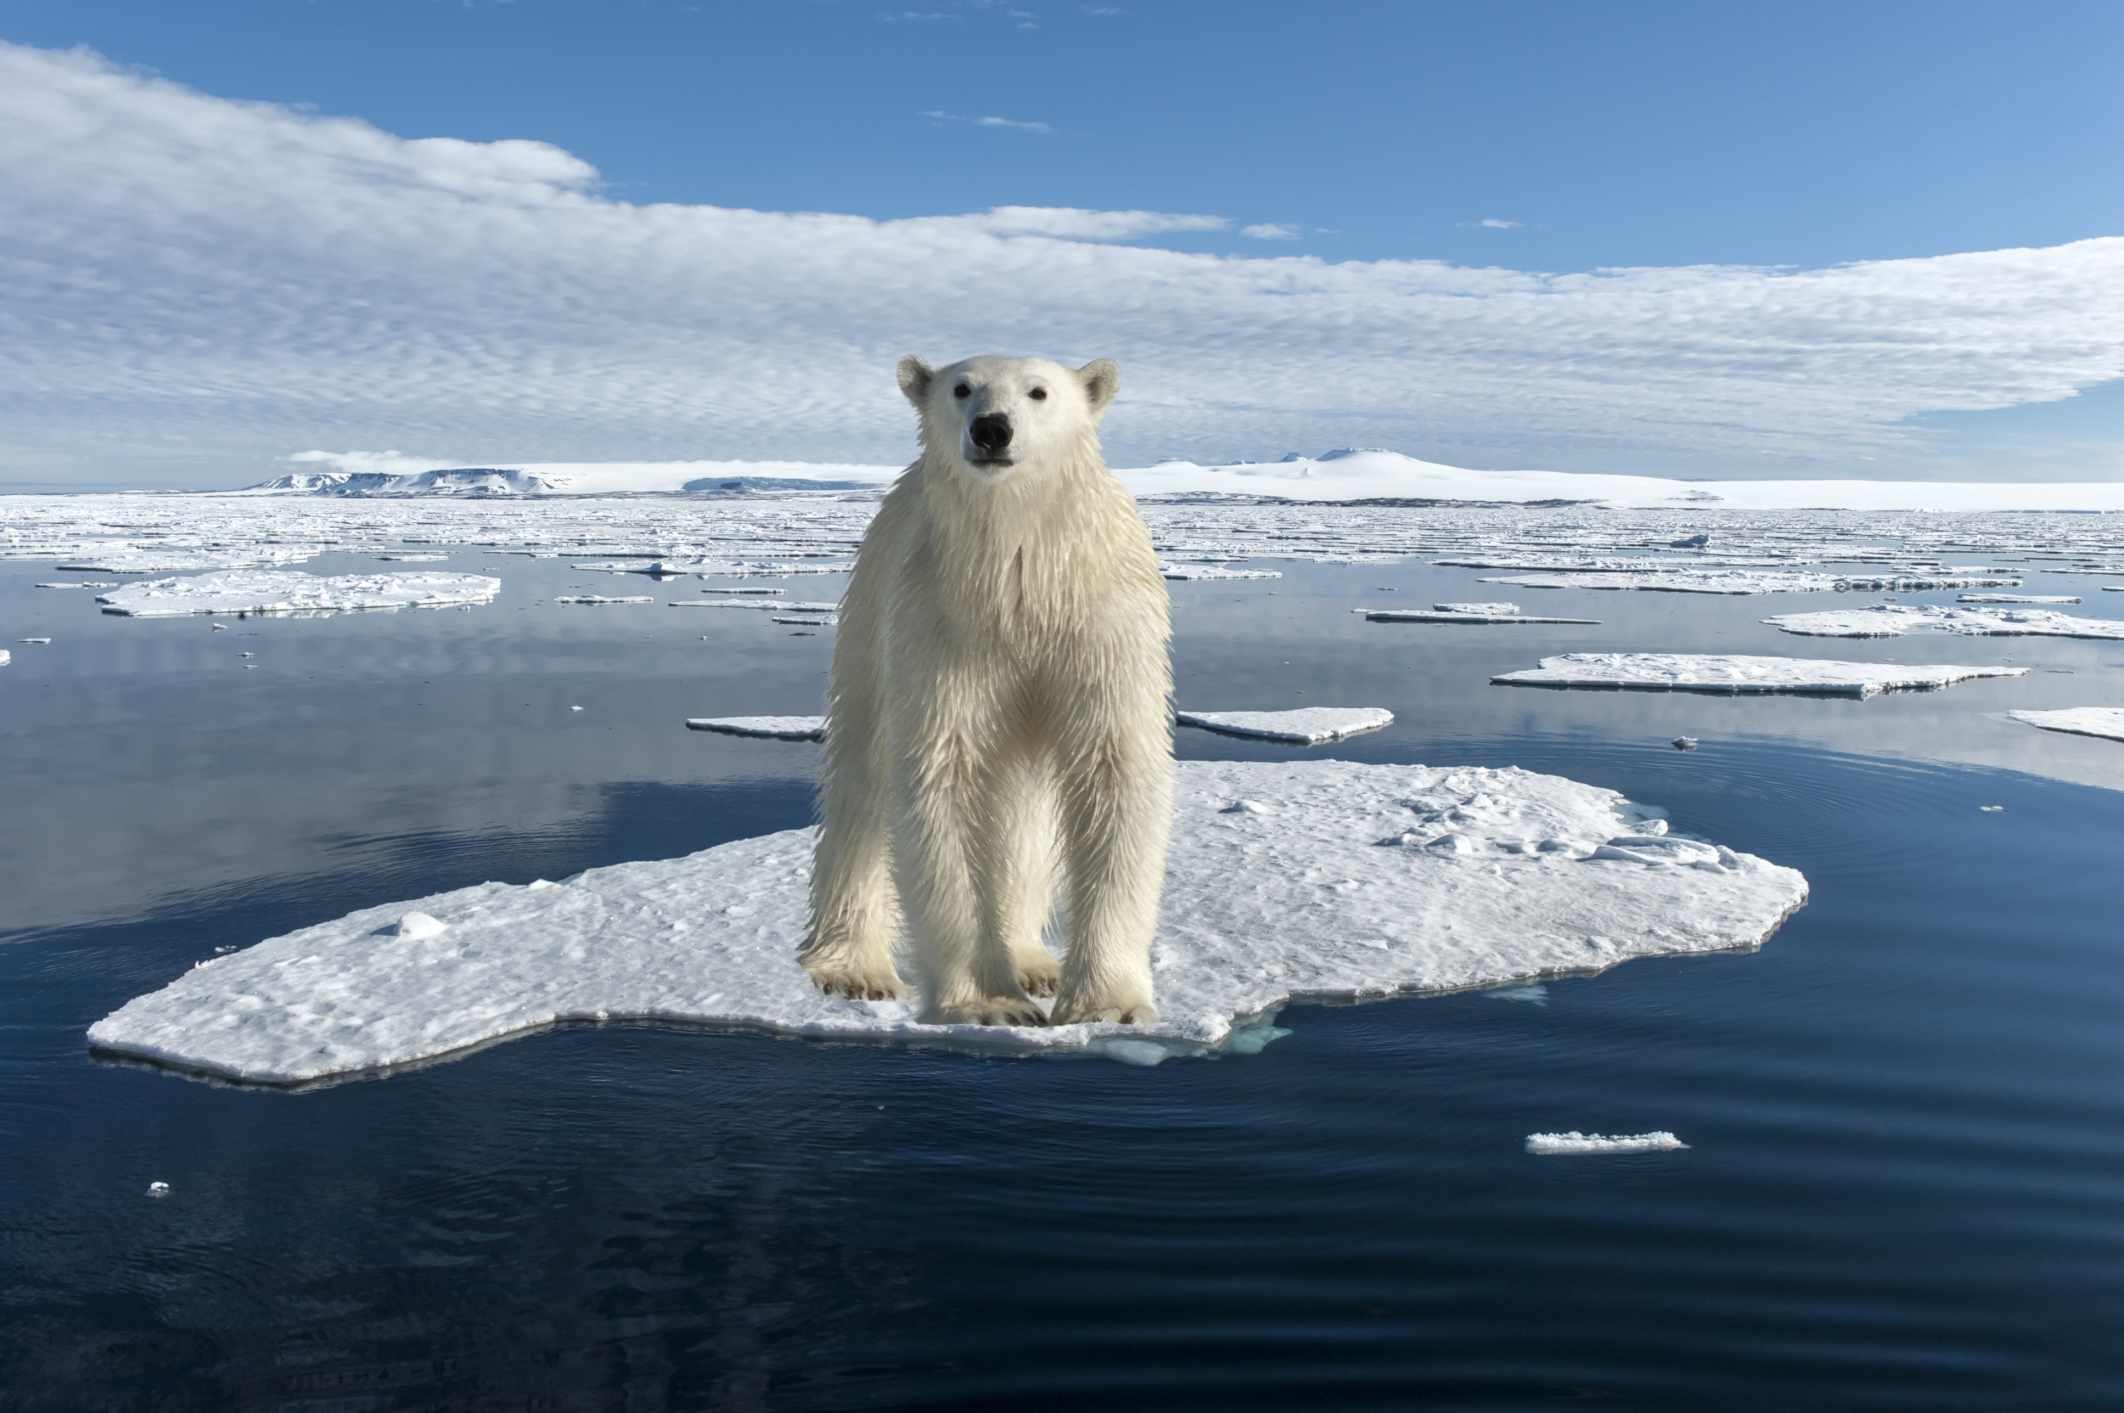 Polar Bear on an ice floe in Norway.